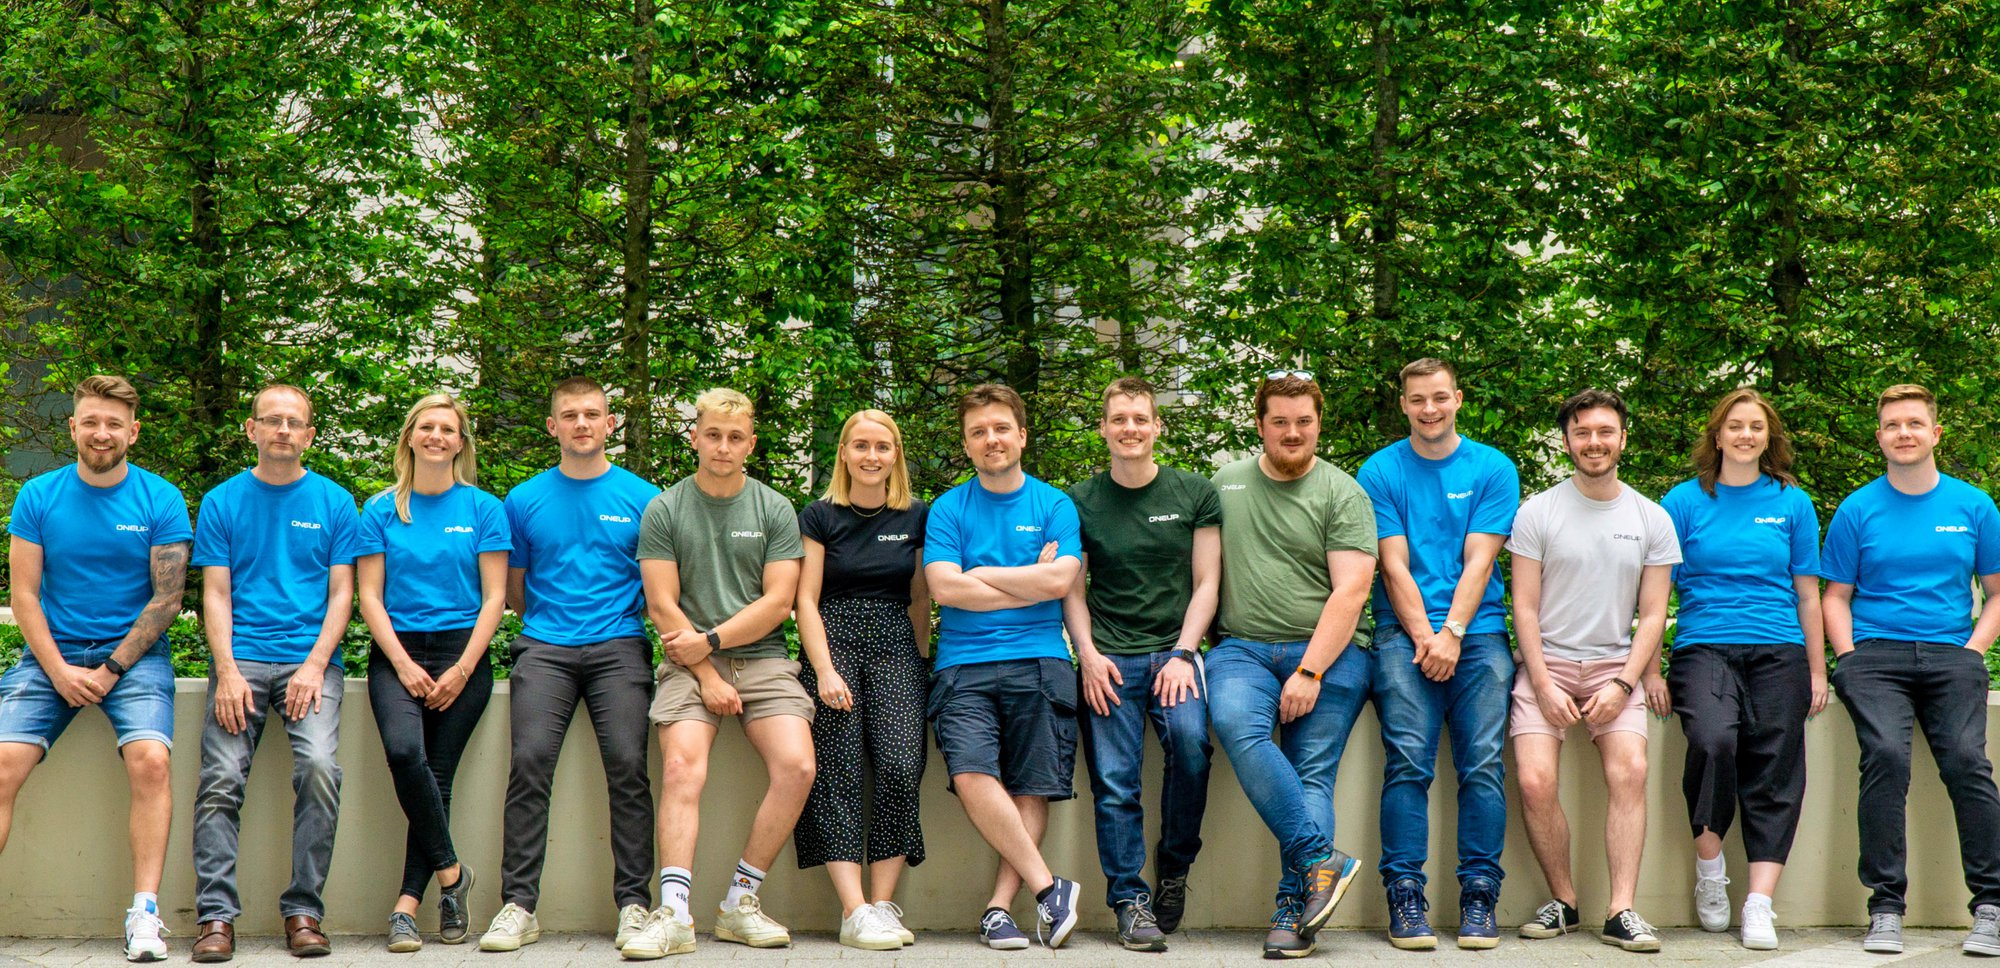 We've raised £600,000 to revolutionise sales management & motivation